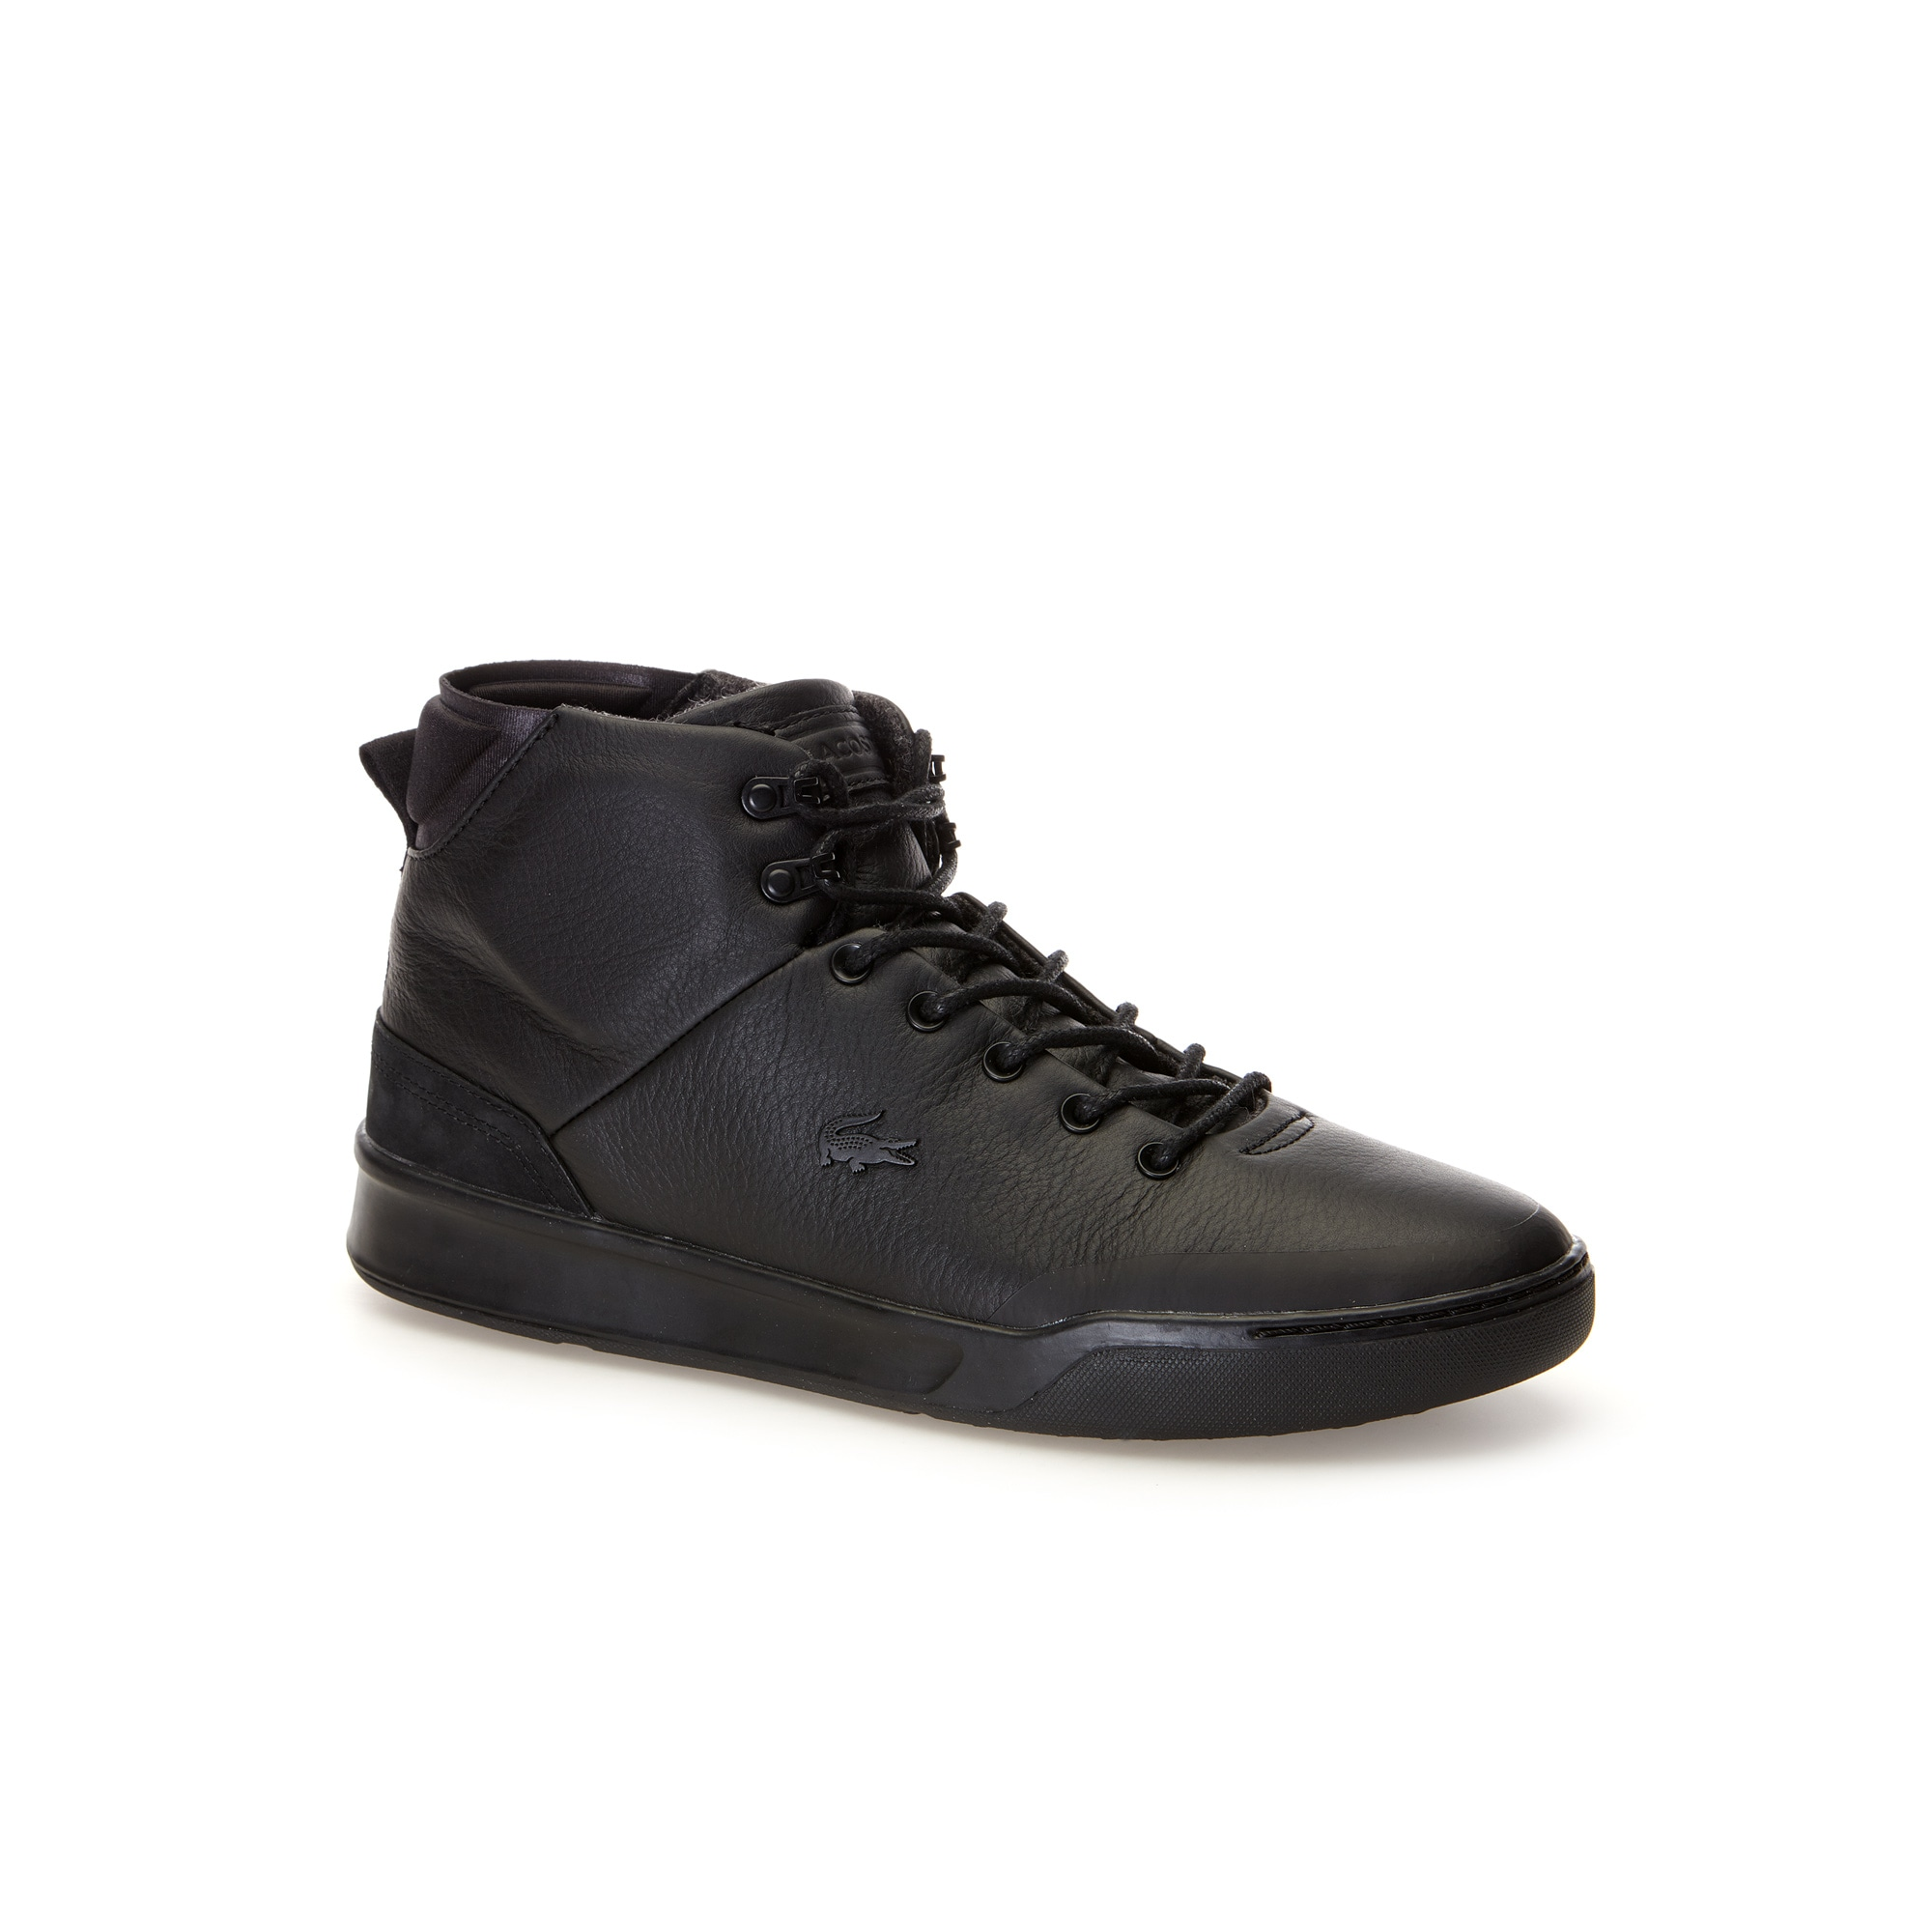 Herren High-Top Sneakers EXPLORATEUR CLASSIC BLACK aus Leder